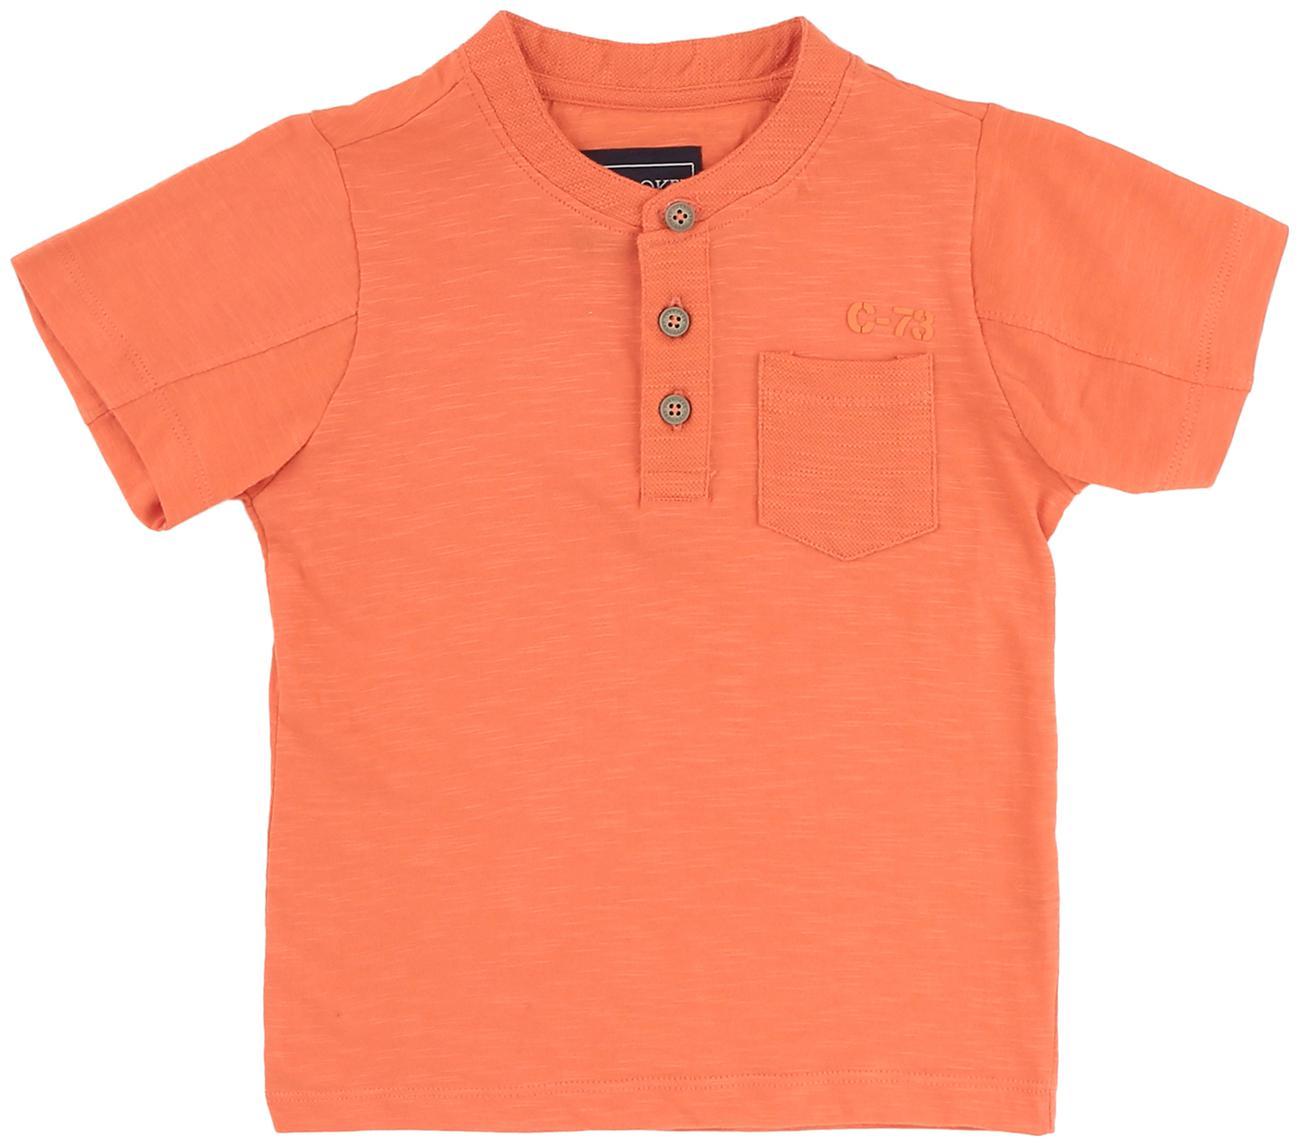 CHEROKEE Boy Cotton Solid T-shirt - Orange